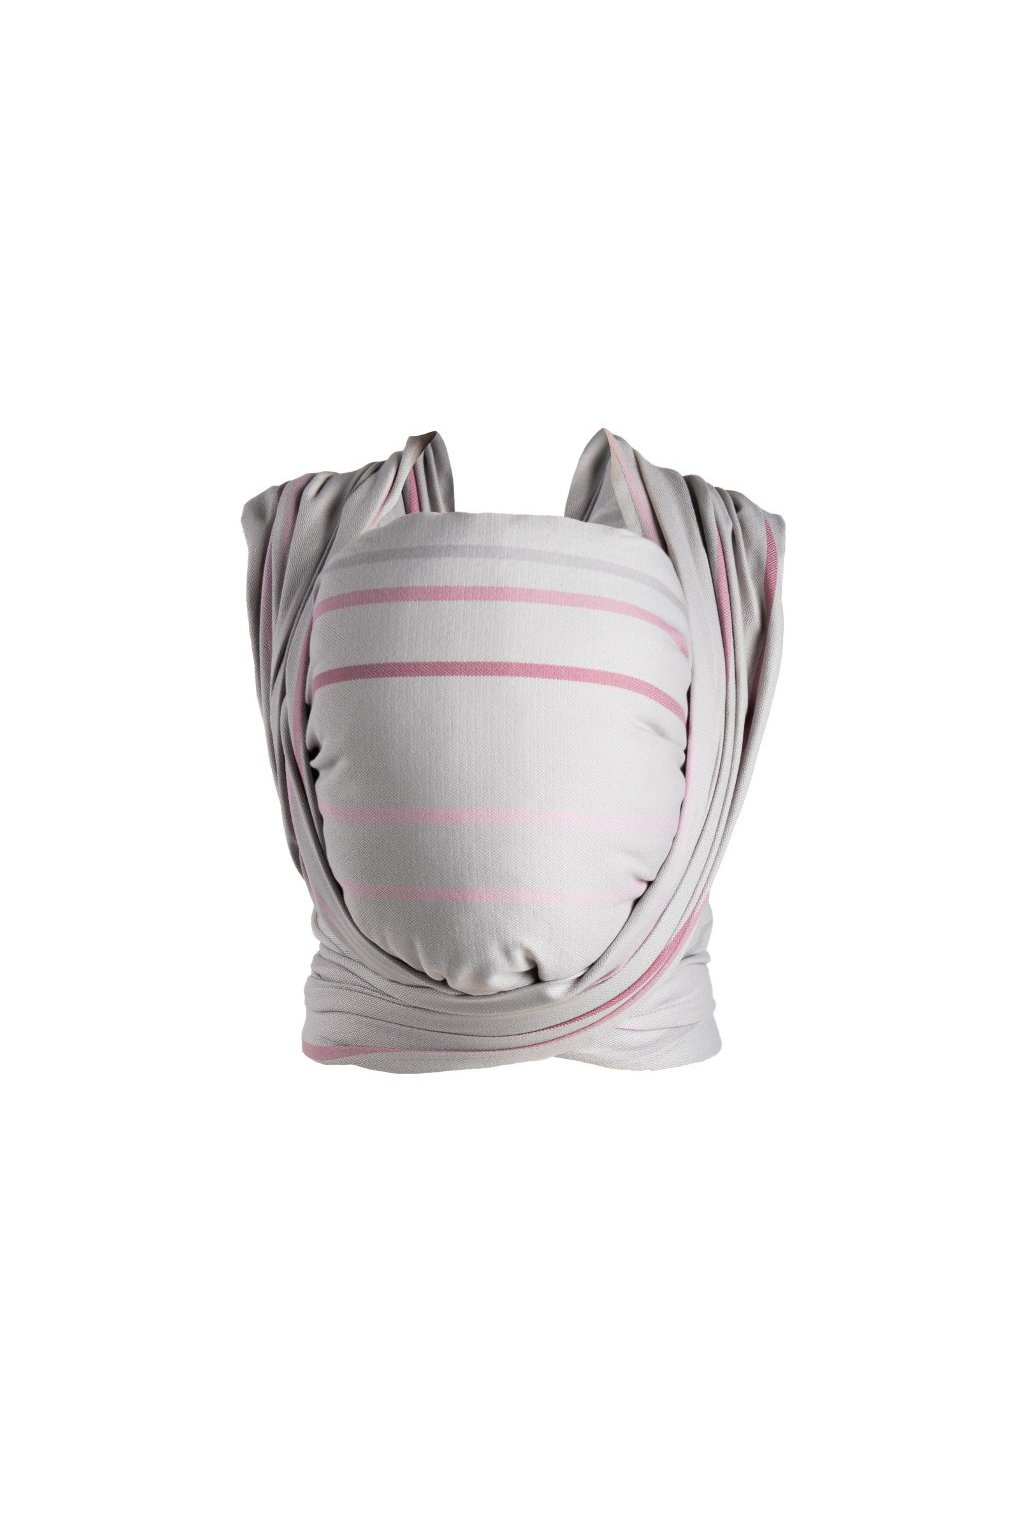 Šatka Womar na nosení detí Be Close ružovo-sivá